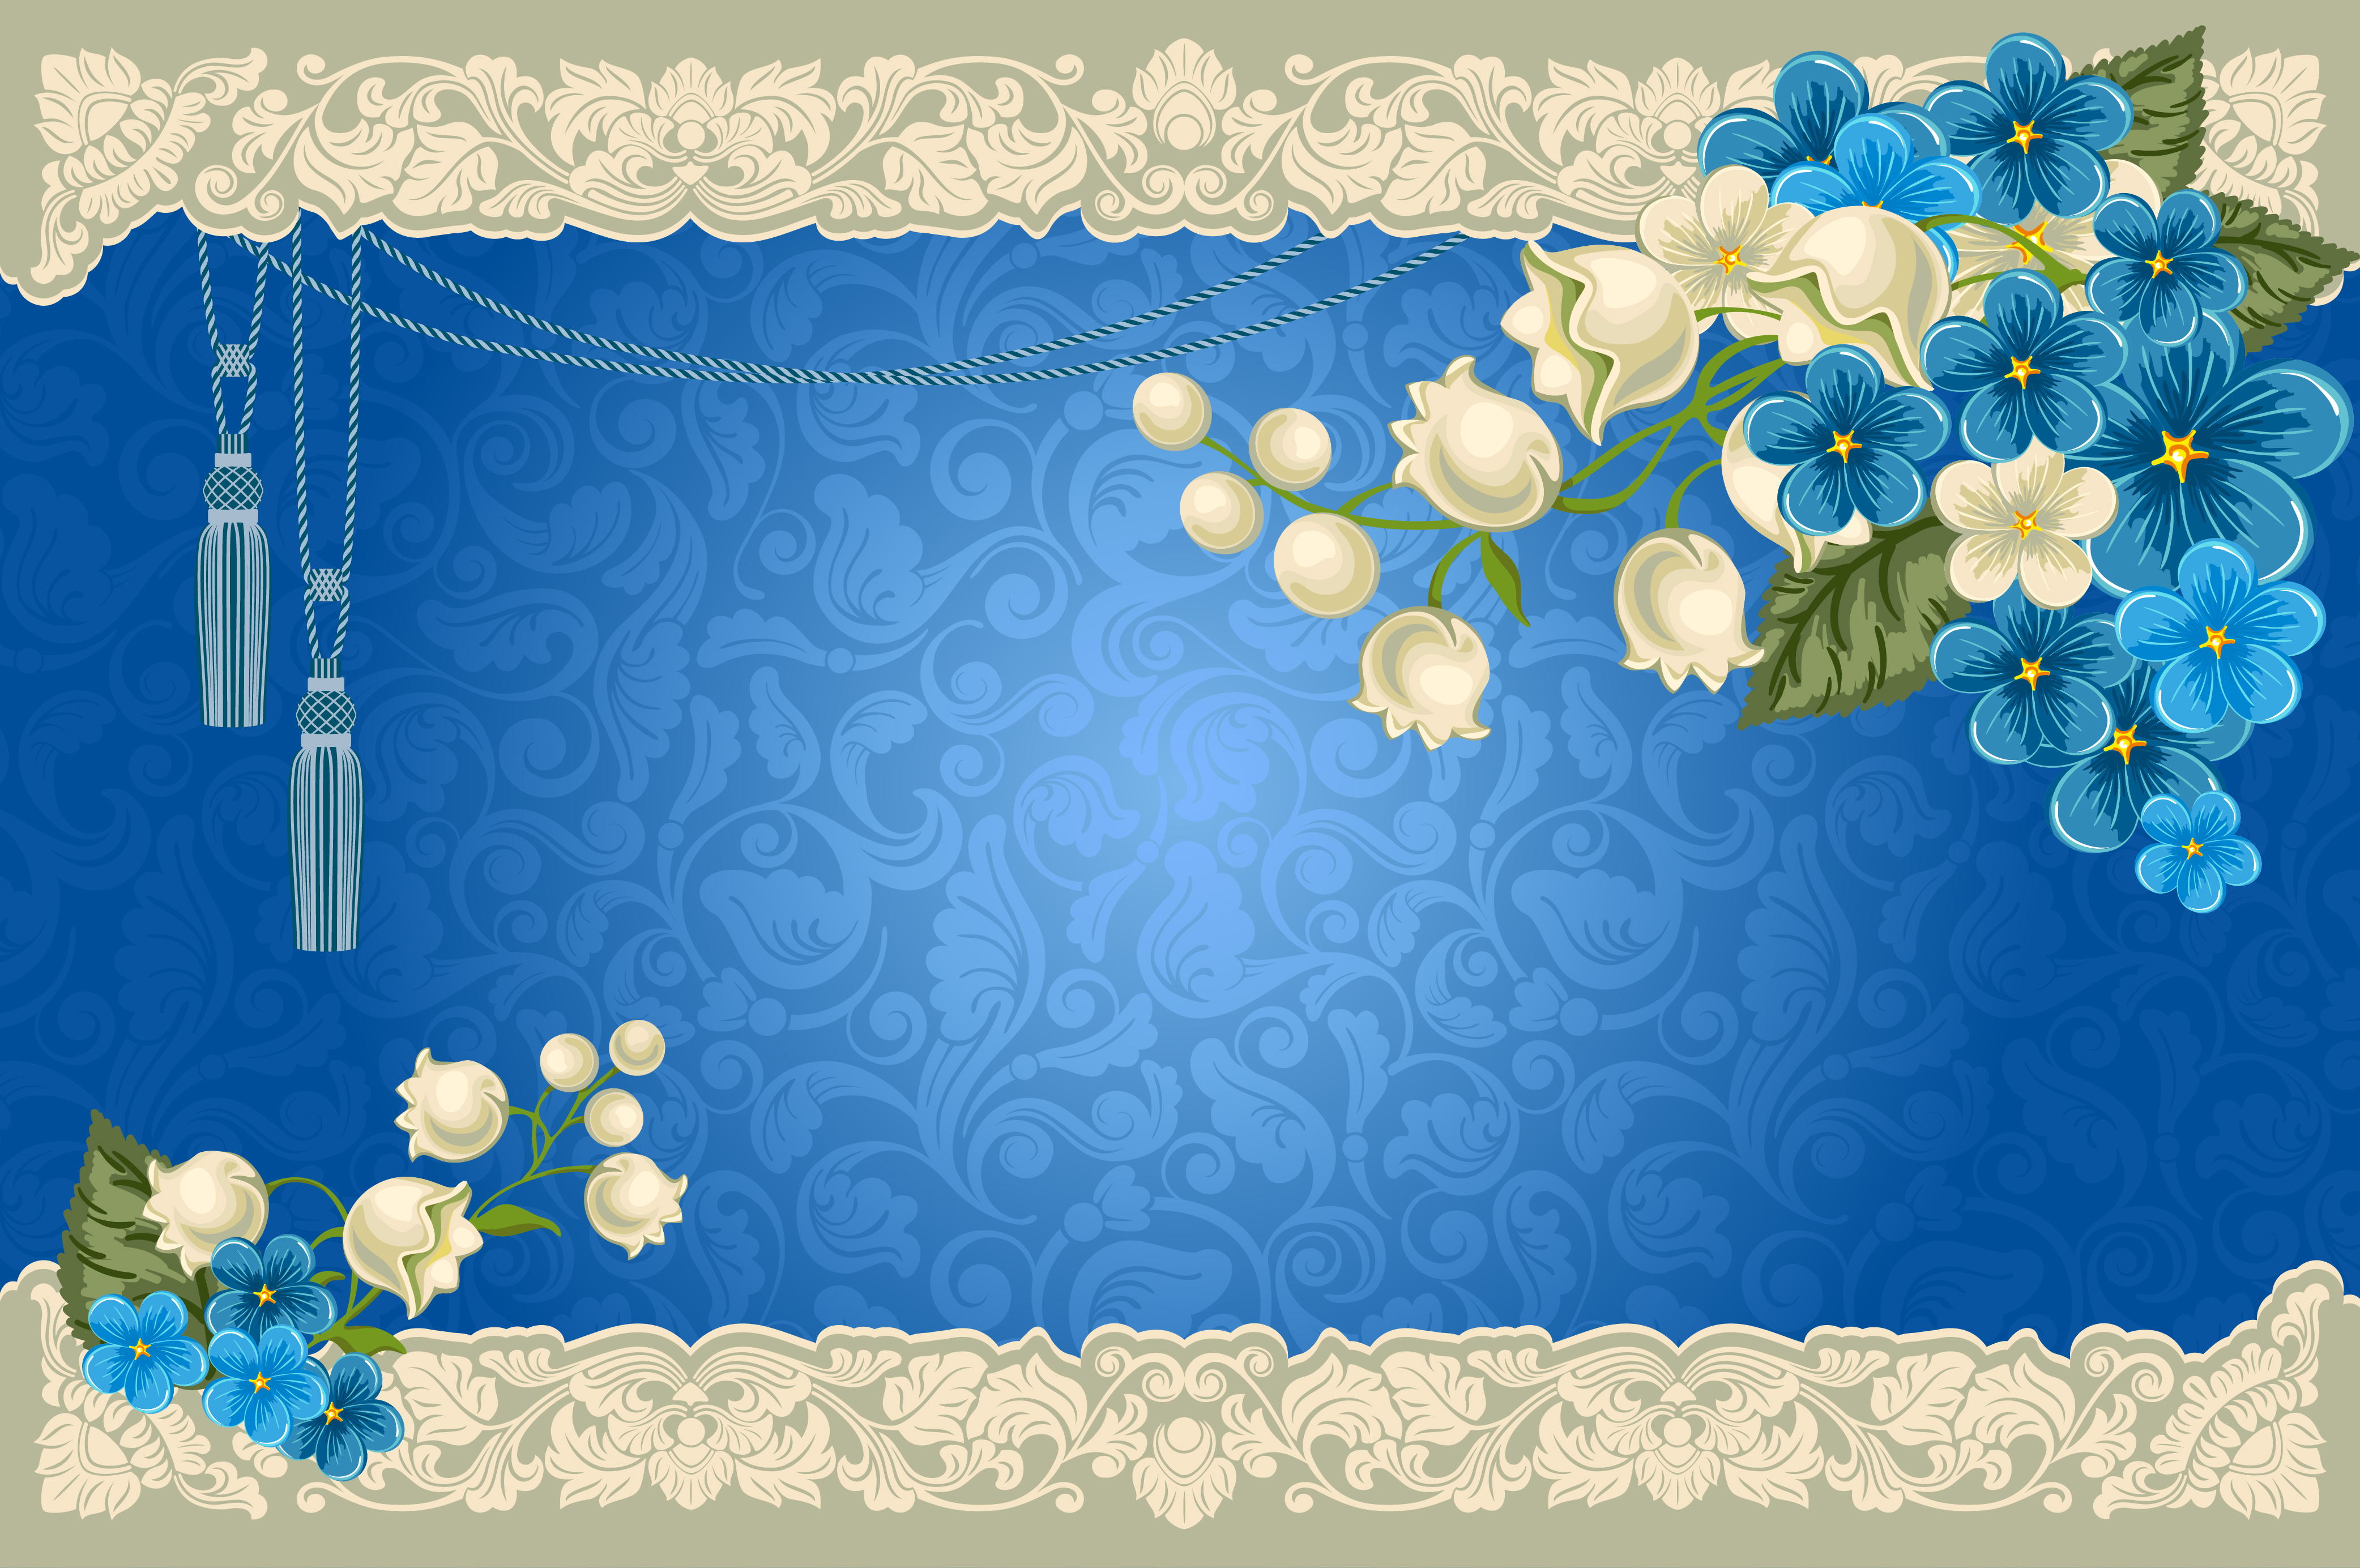 paisley floral azul fronteira background decora u00e7 u00e3o floral cart u00e3o de convite flower frame imagem